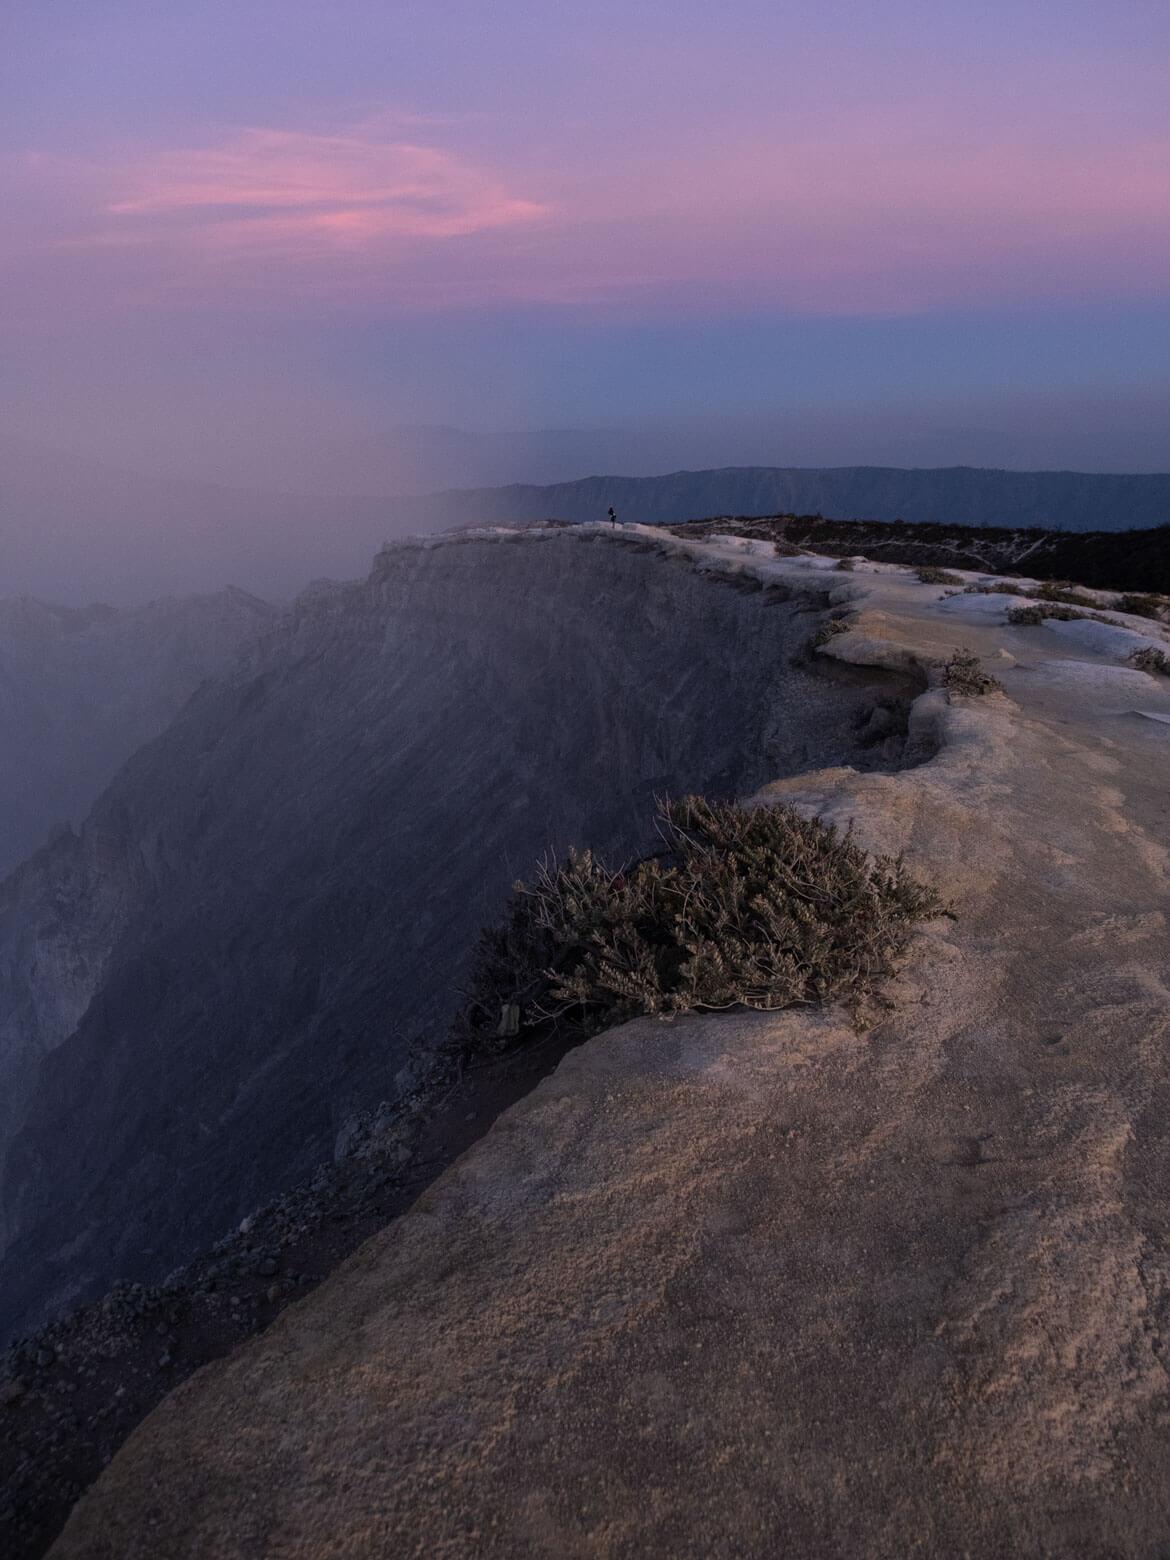 Alba viewpoint Kawah Ijen